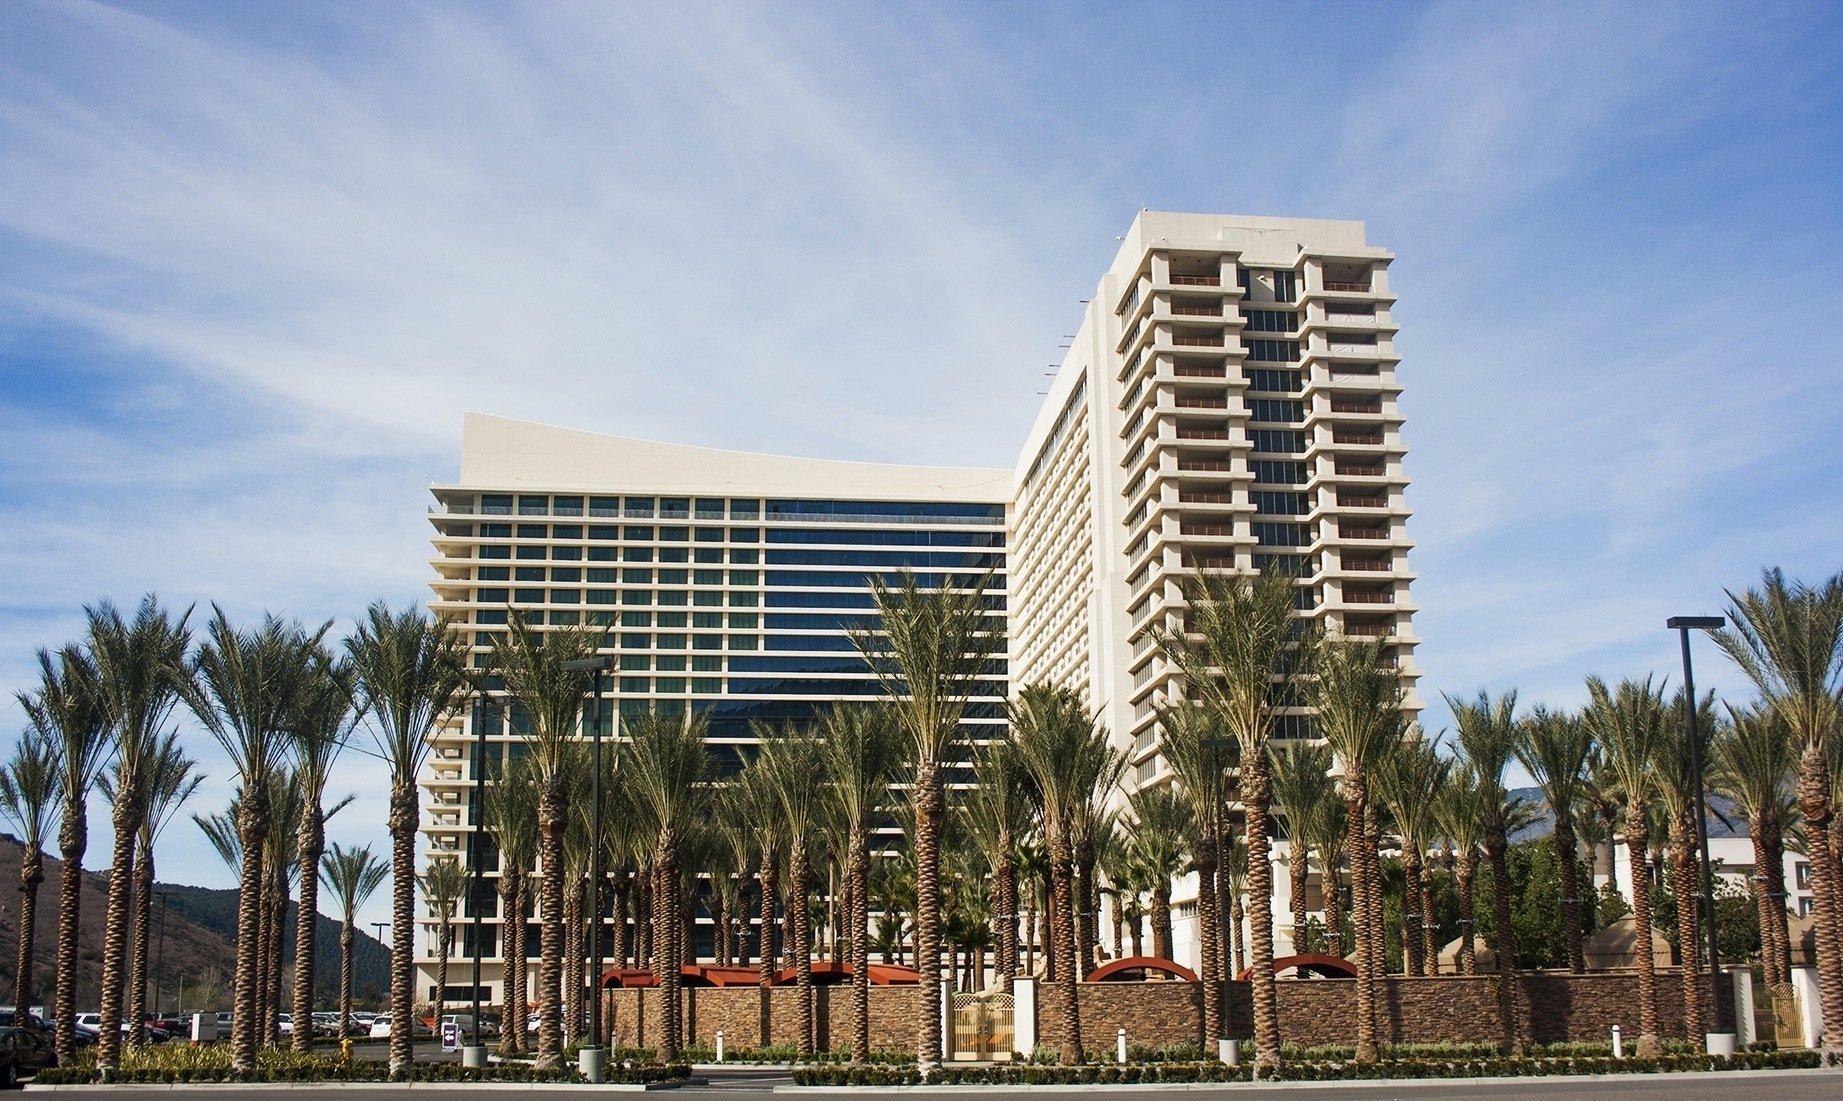 Harrahs Hotel And Casino San Diego